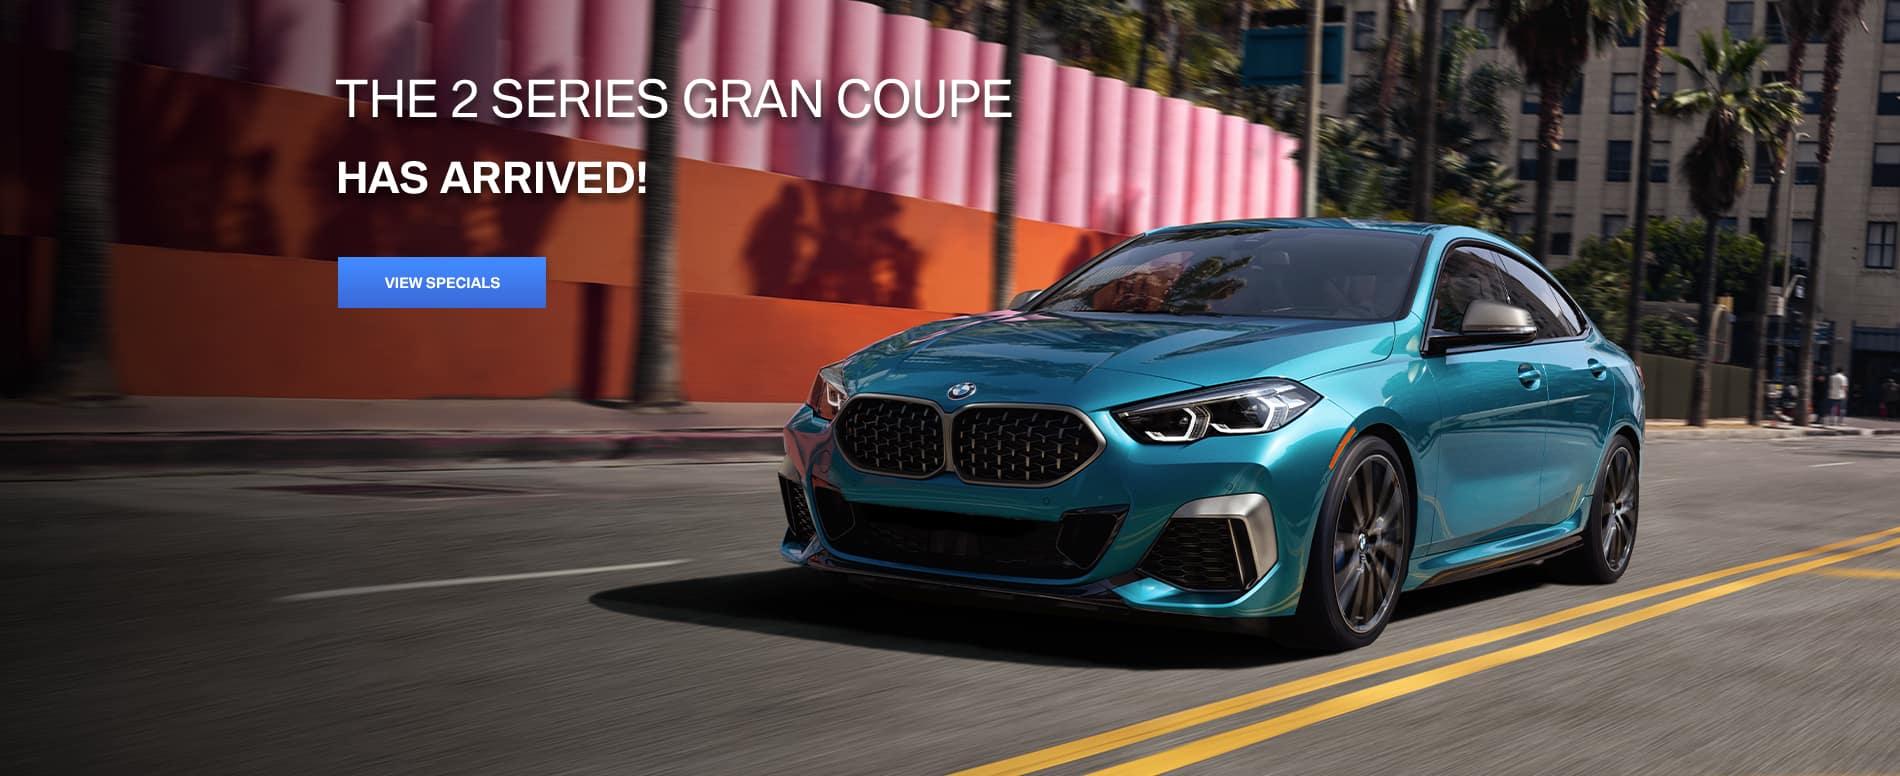 2 Series Gran Coupe